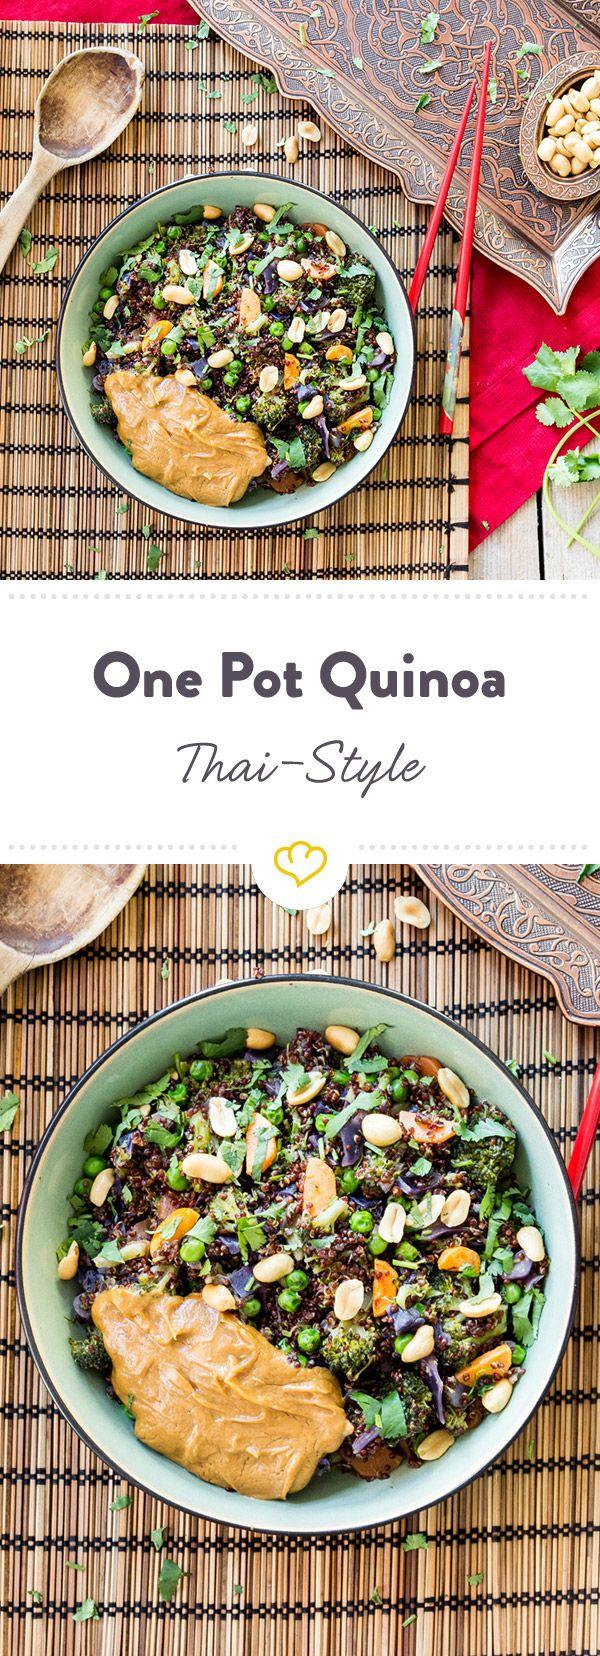 One Pot Quinoa 'Thai Style' mit Erdnusssauce #thaifoodrecipes